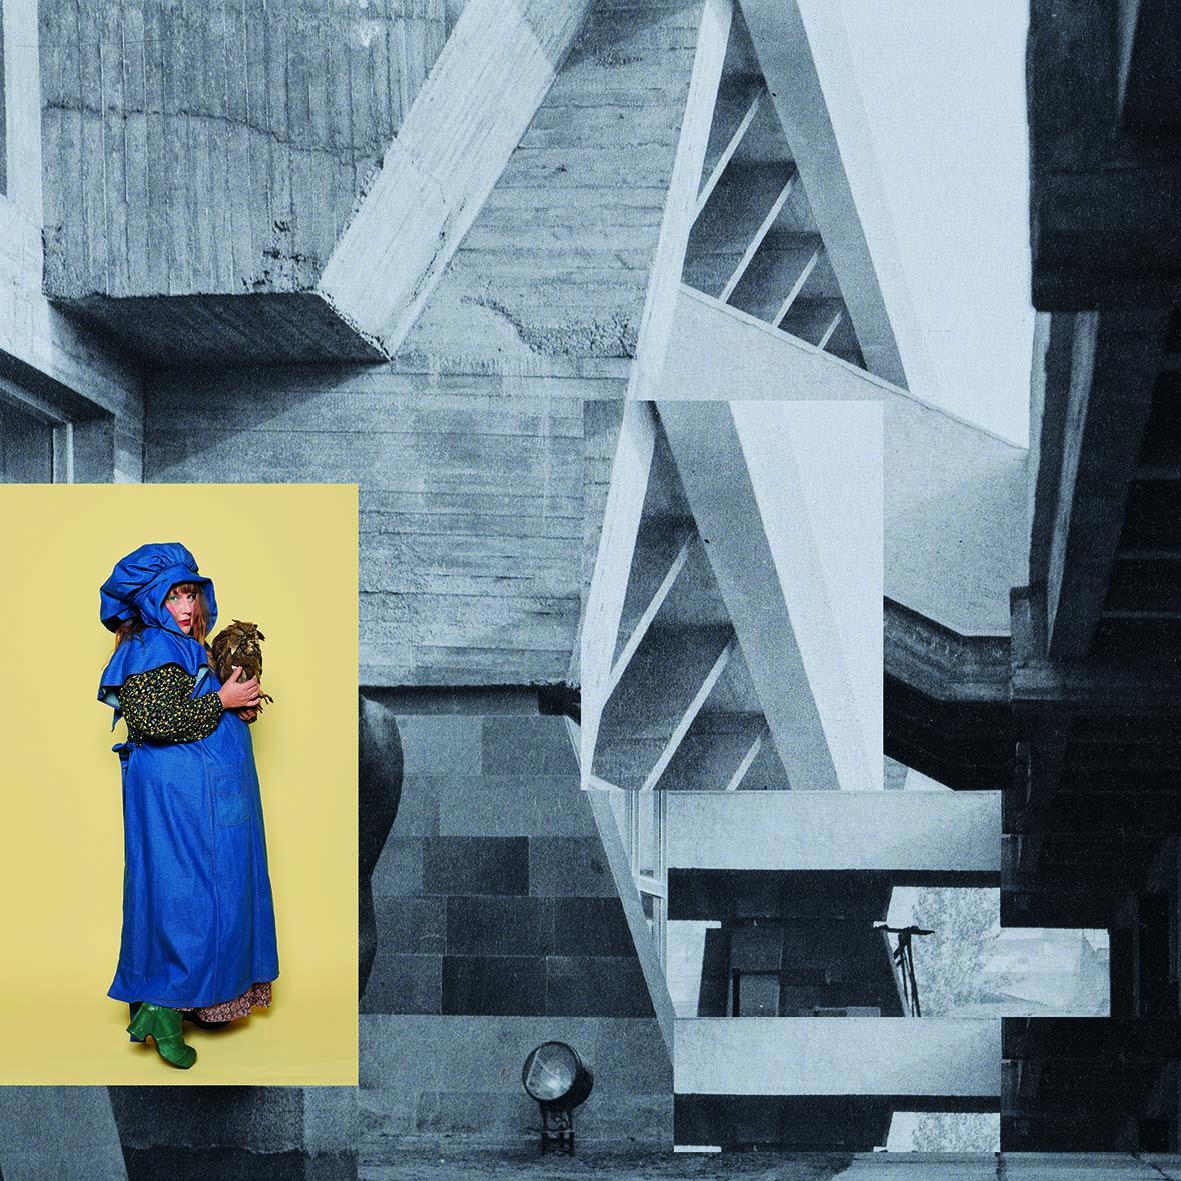 interview, story, solo presentations, brand new art, installation, art lovers,jakob lena knebl